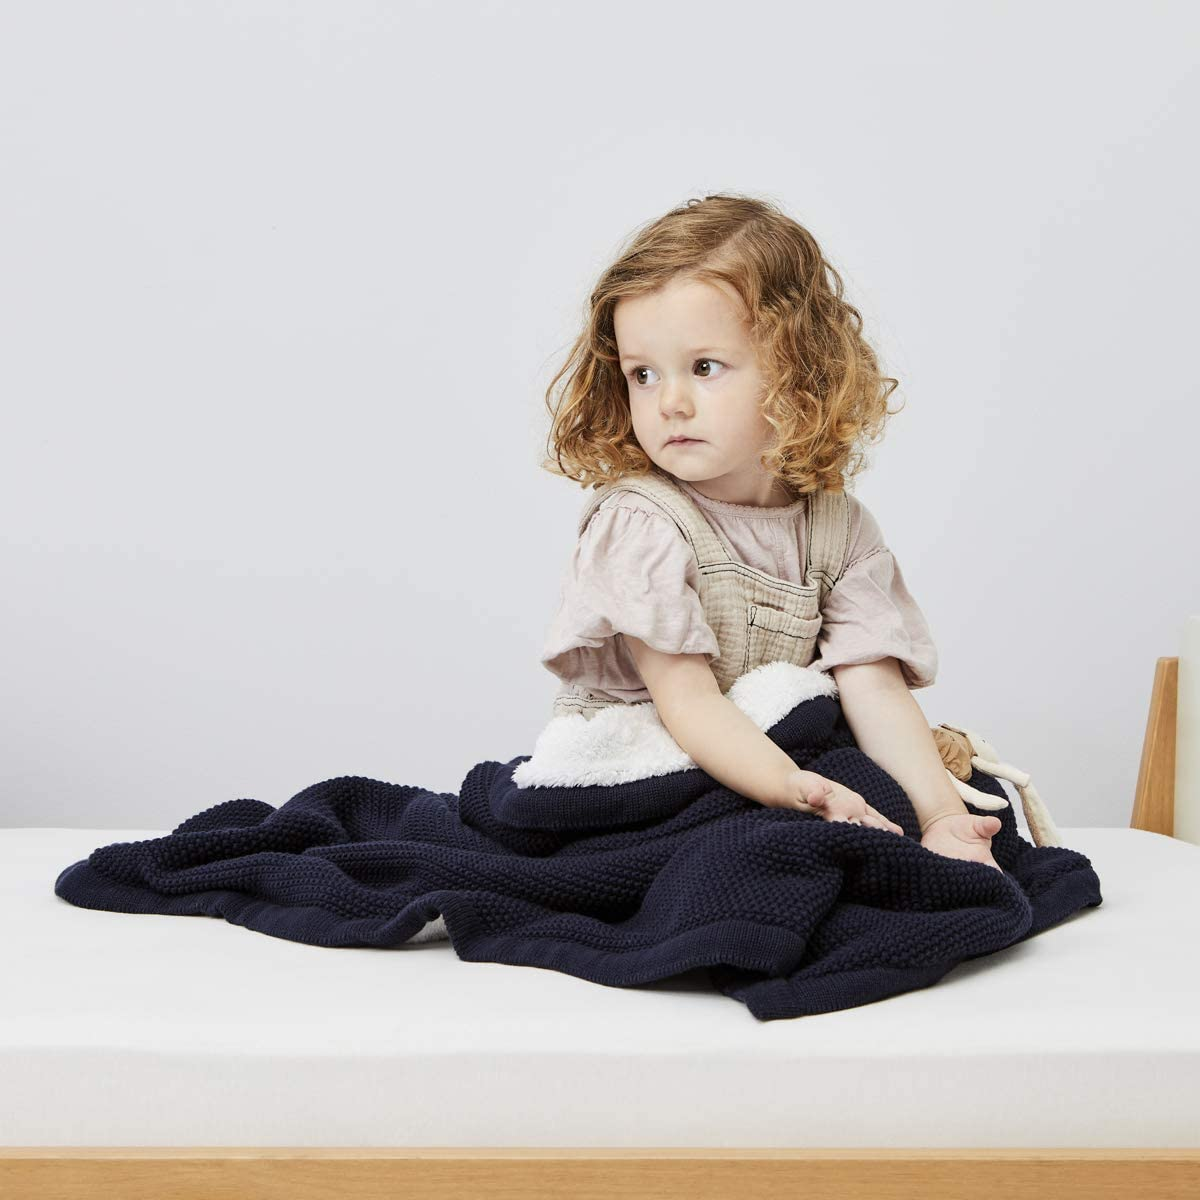 The Little Green Sheep Organic Knitted Fleece Baby Blanket Linen